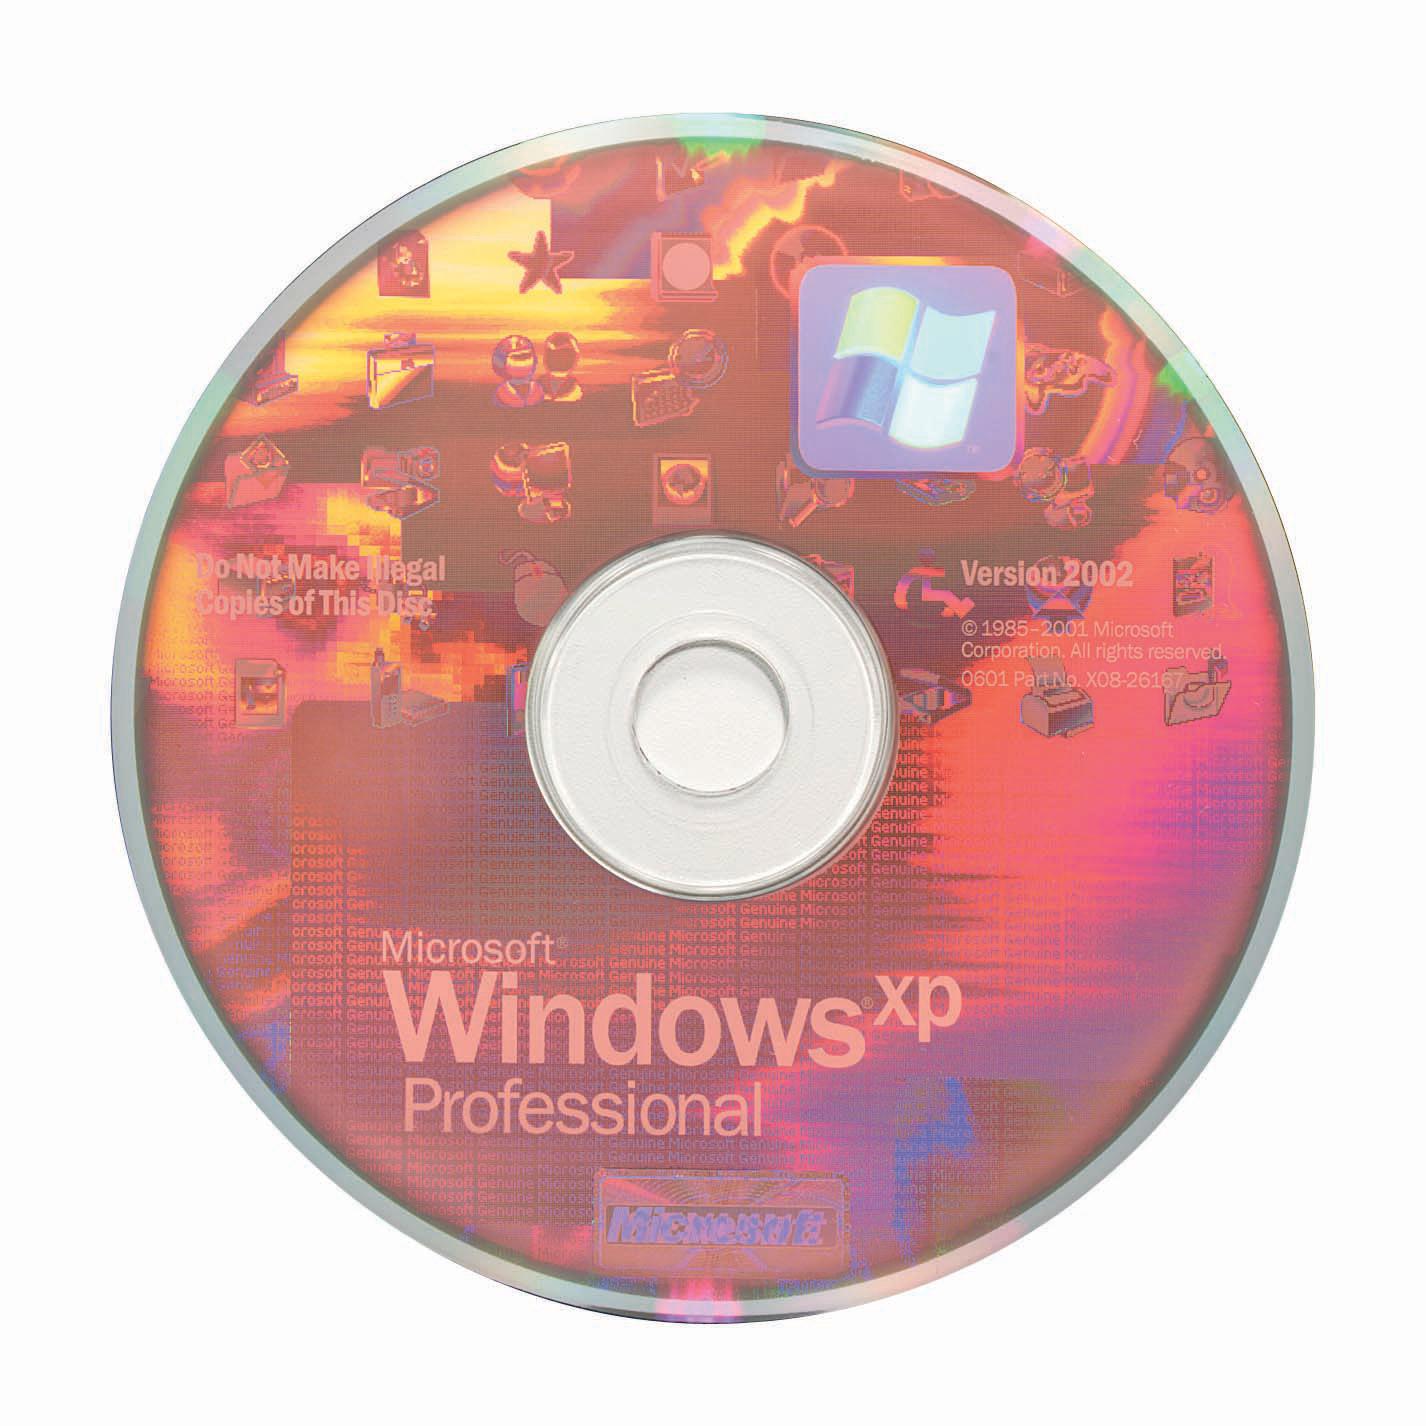 Create a bootable CD emergency repair disc for XP